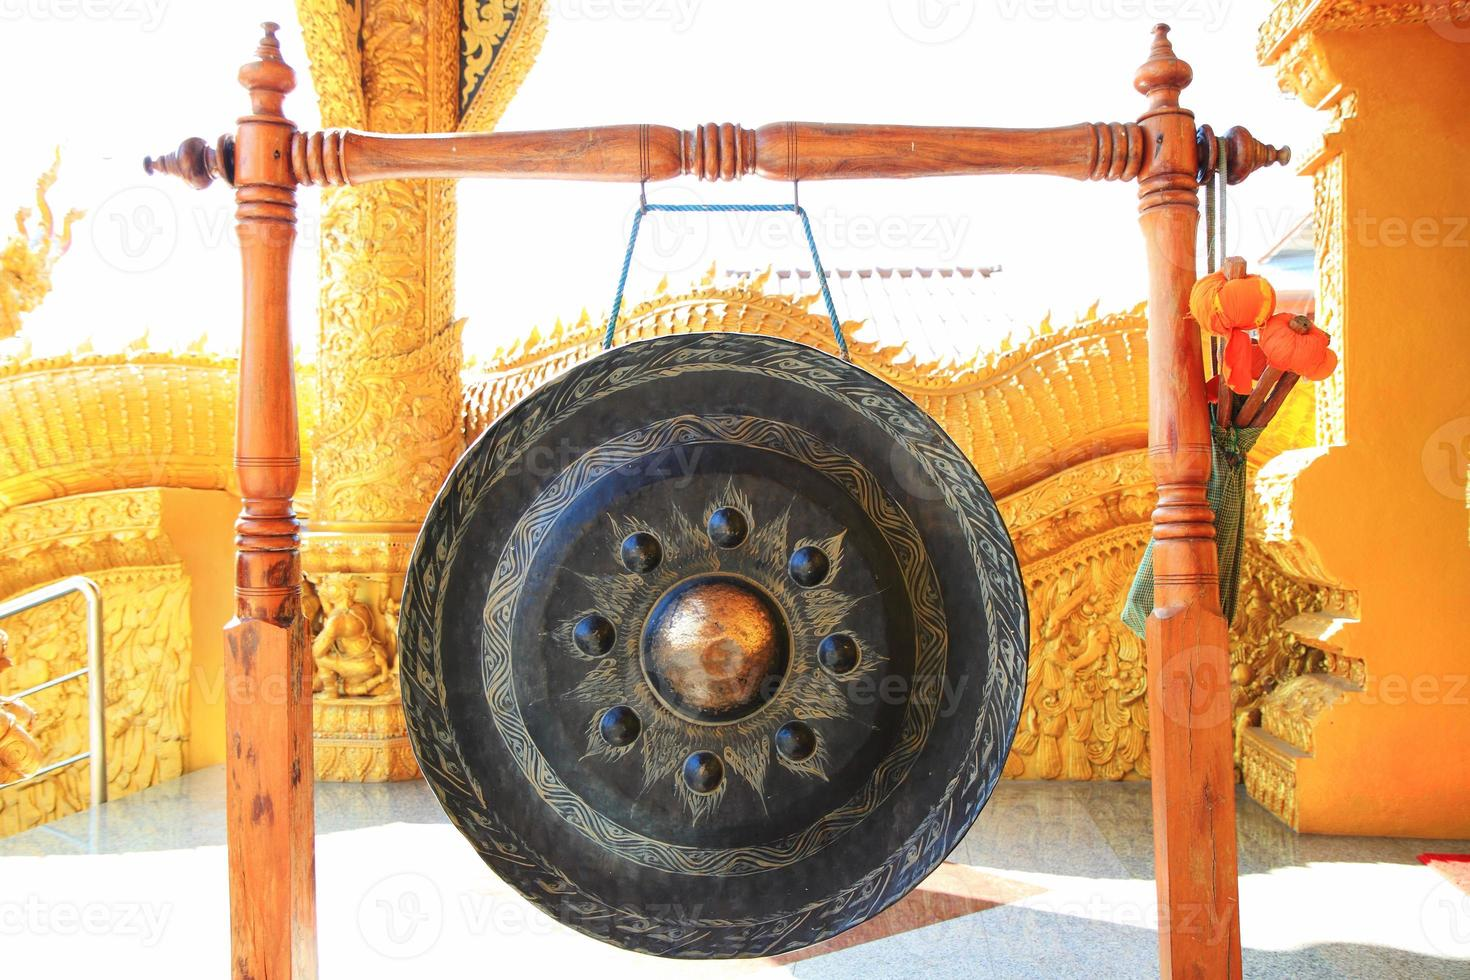 gong photo